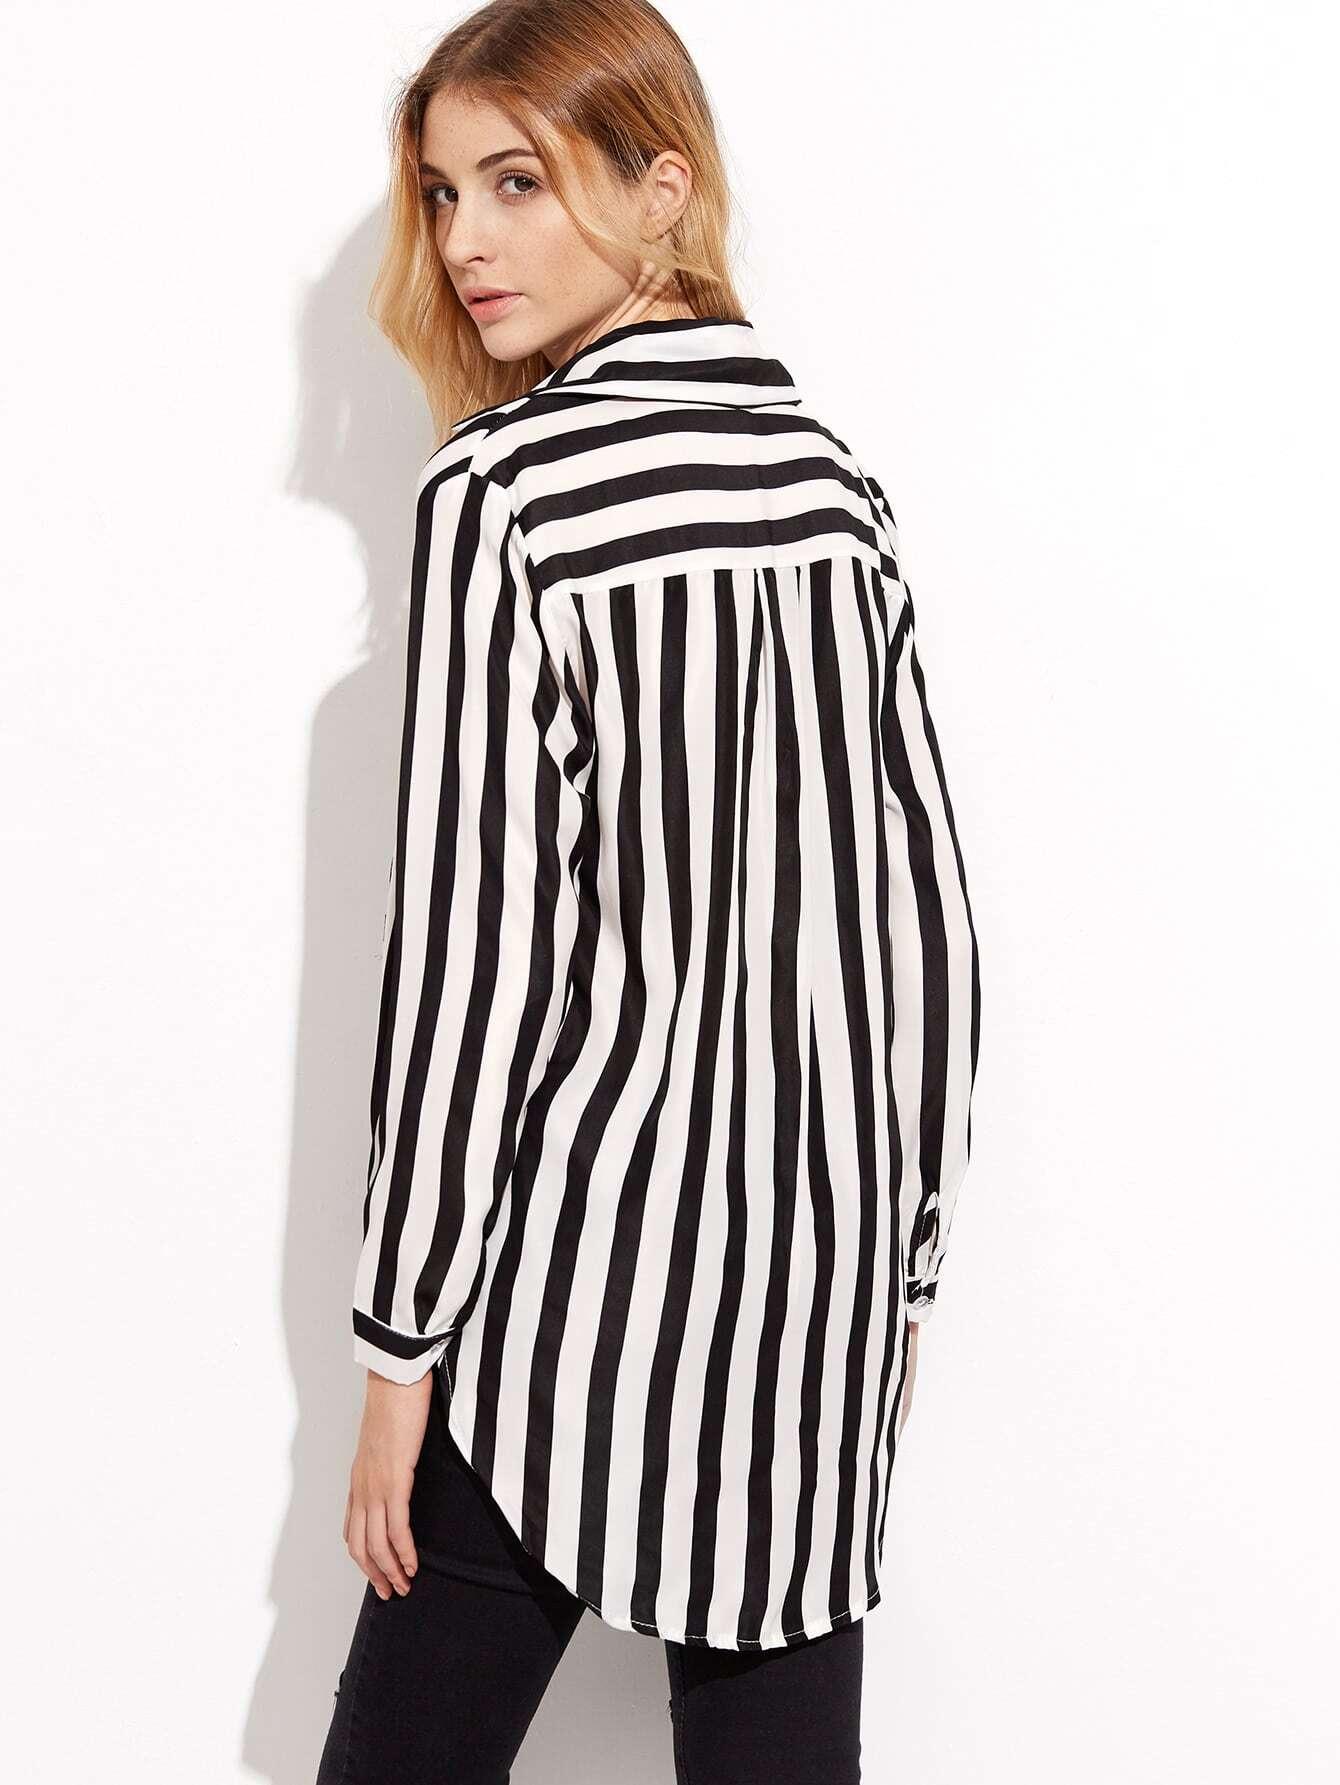 blouse160825002_2